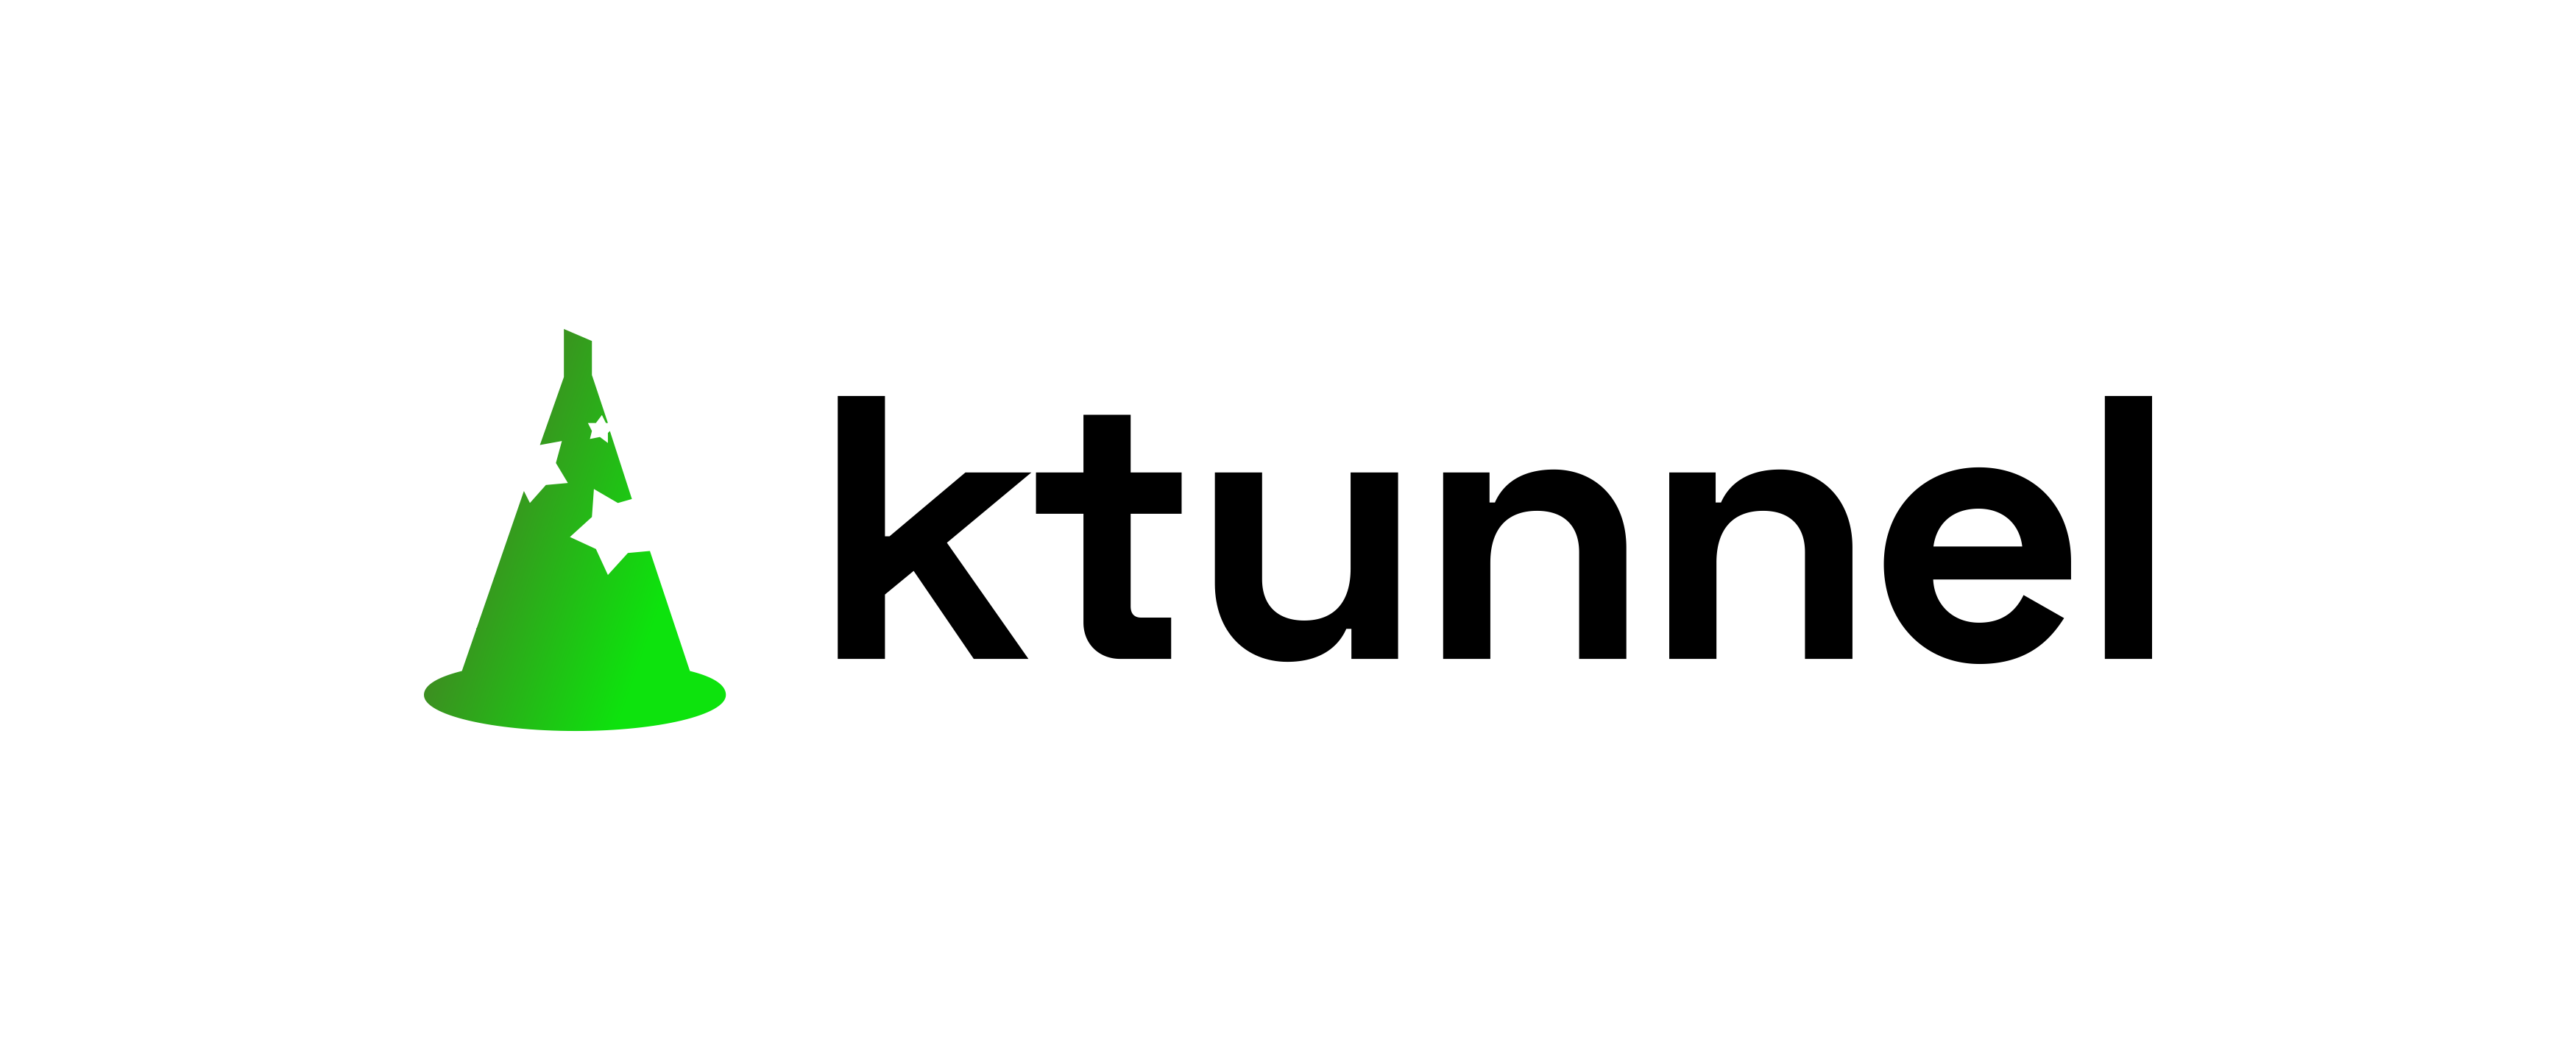 Ktunnel logo